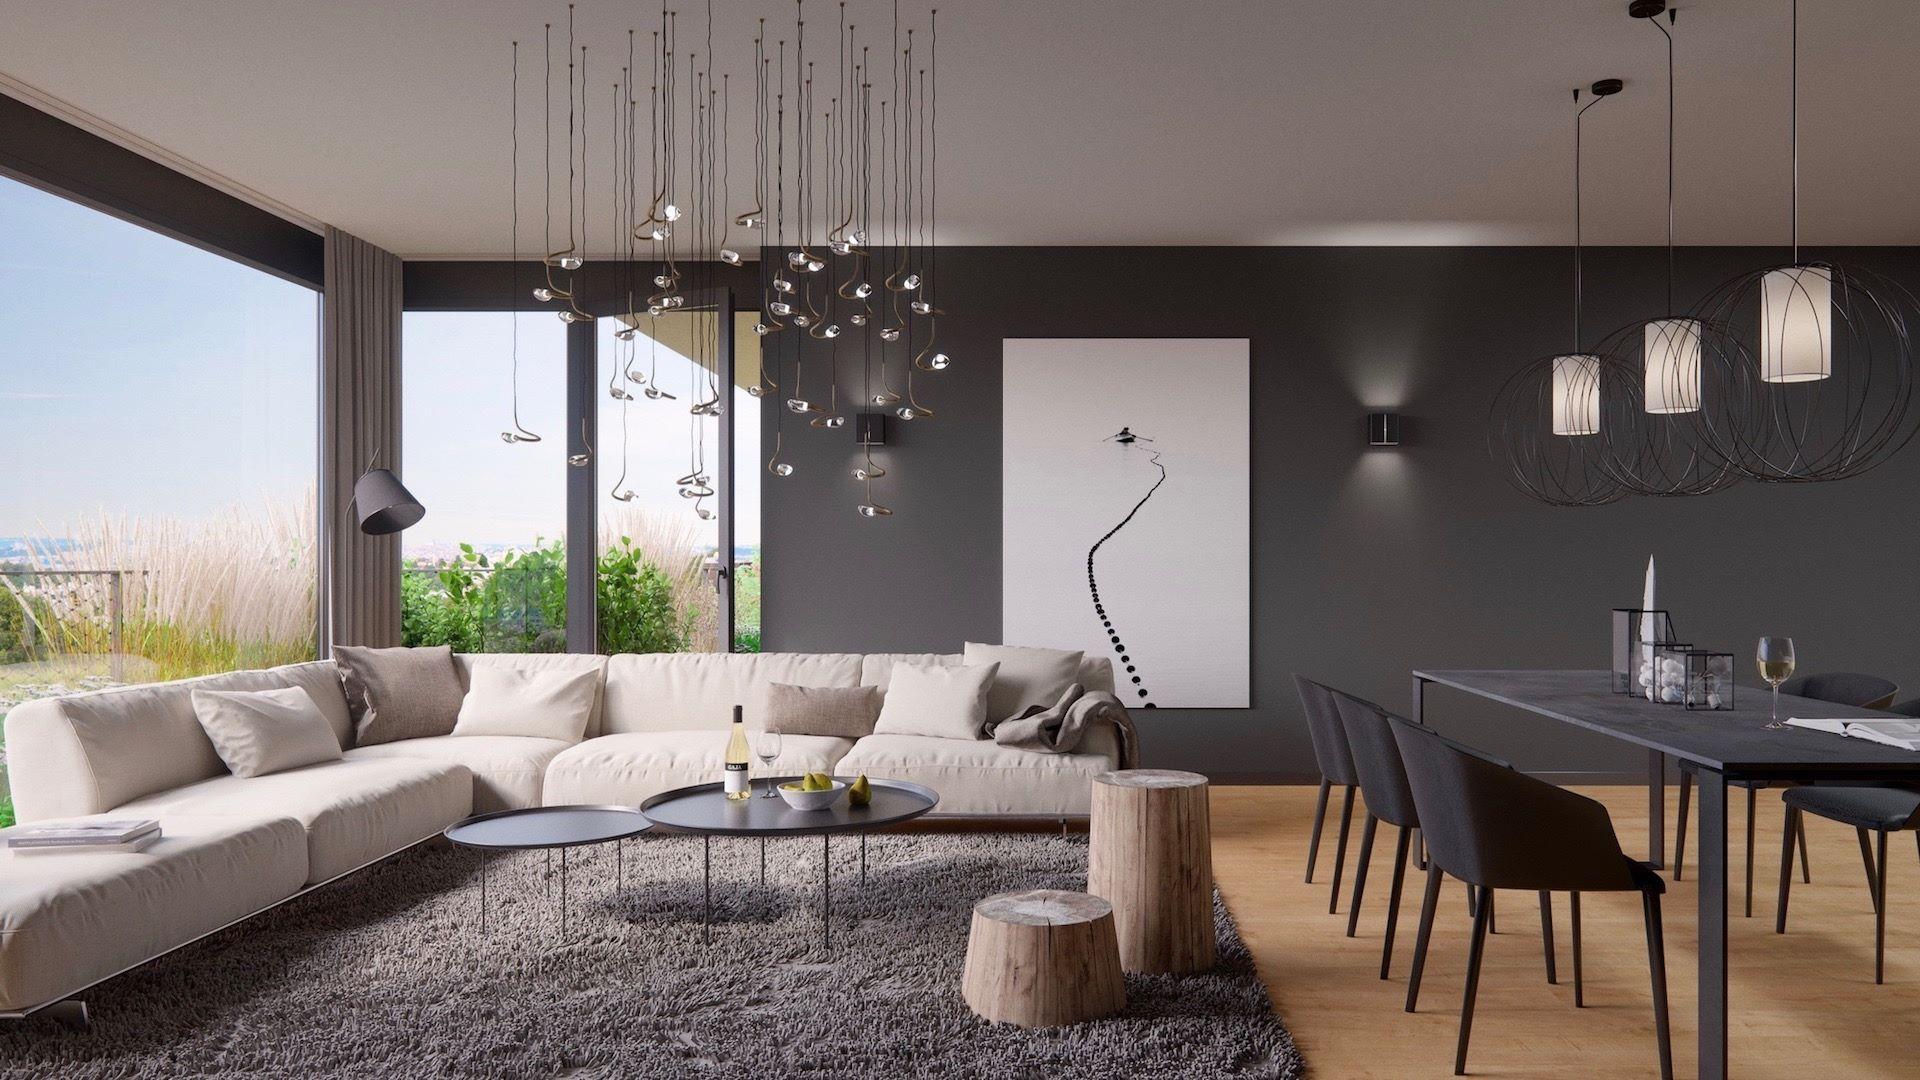 Appartement modèle, SAKURA, T.E. Development